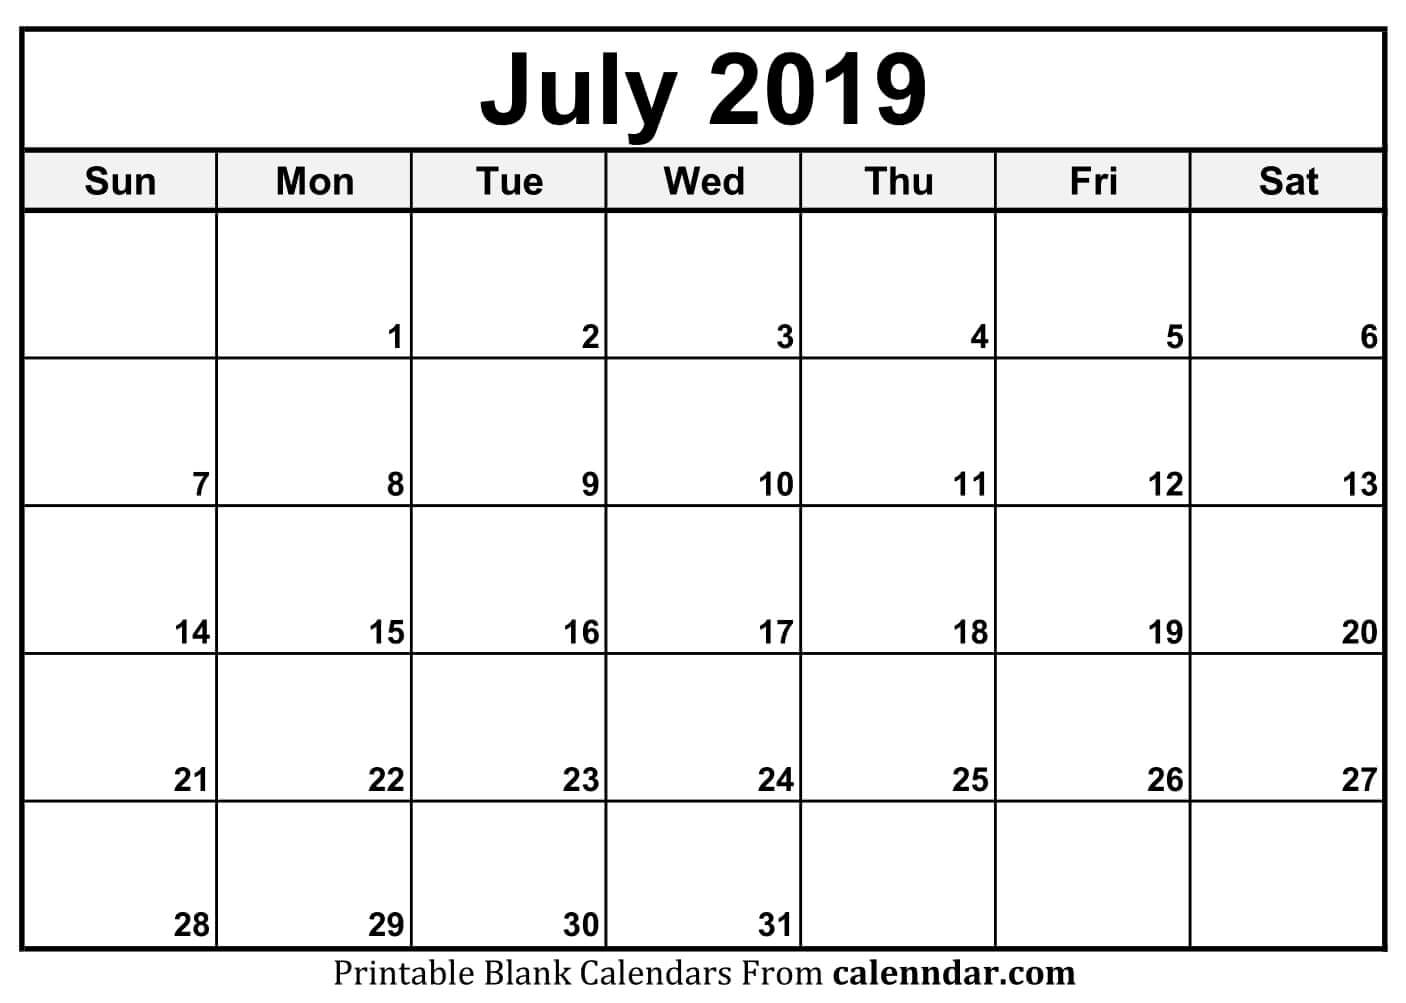 Editable July 2019 Calendar Printable Template With Holidays inside Philippine Blank July Calendar Printable